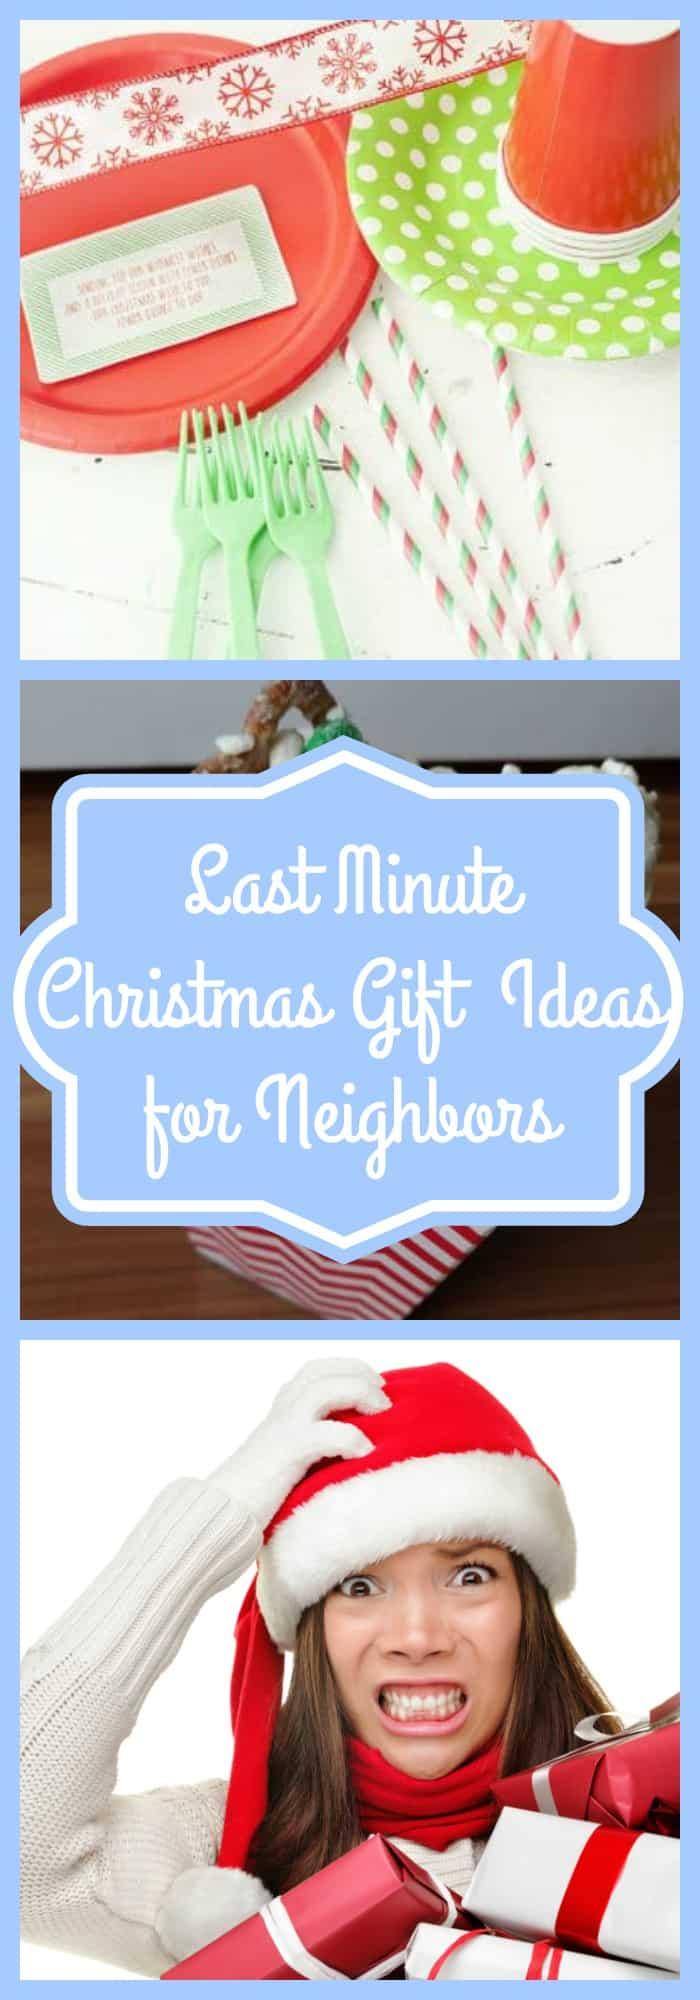 Last Minute Christmas Gift Ideas for Neighbors